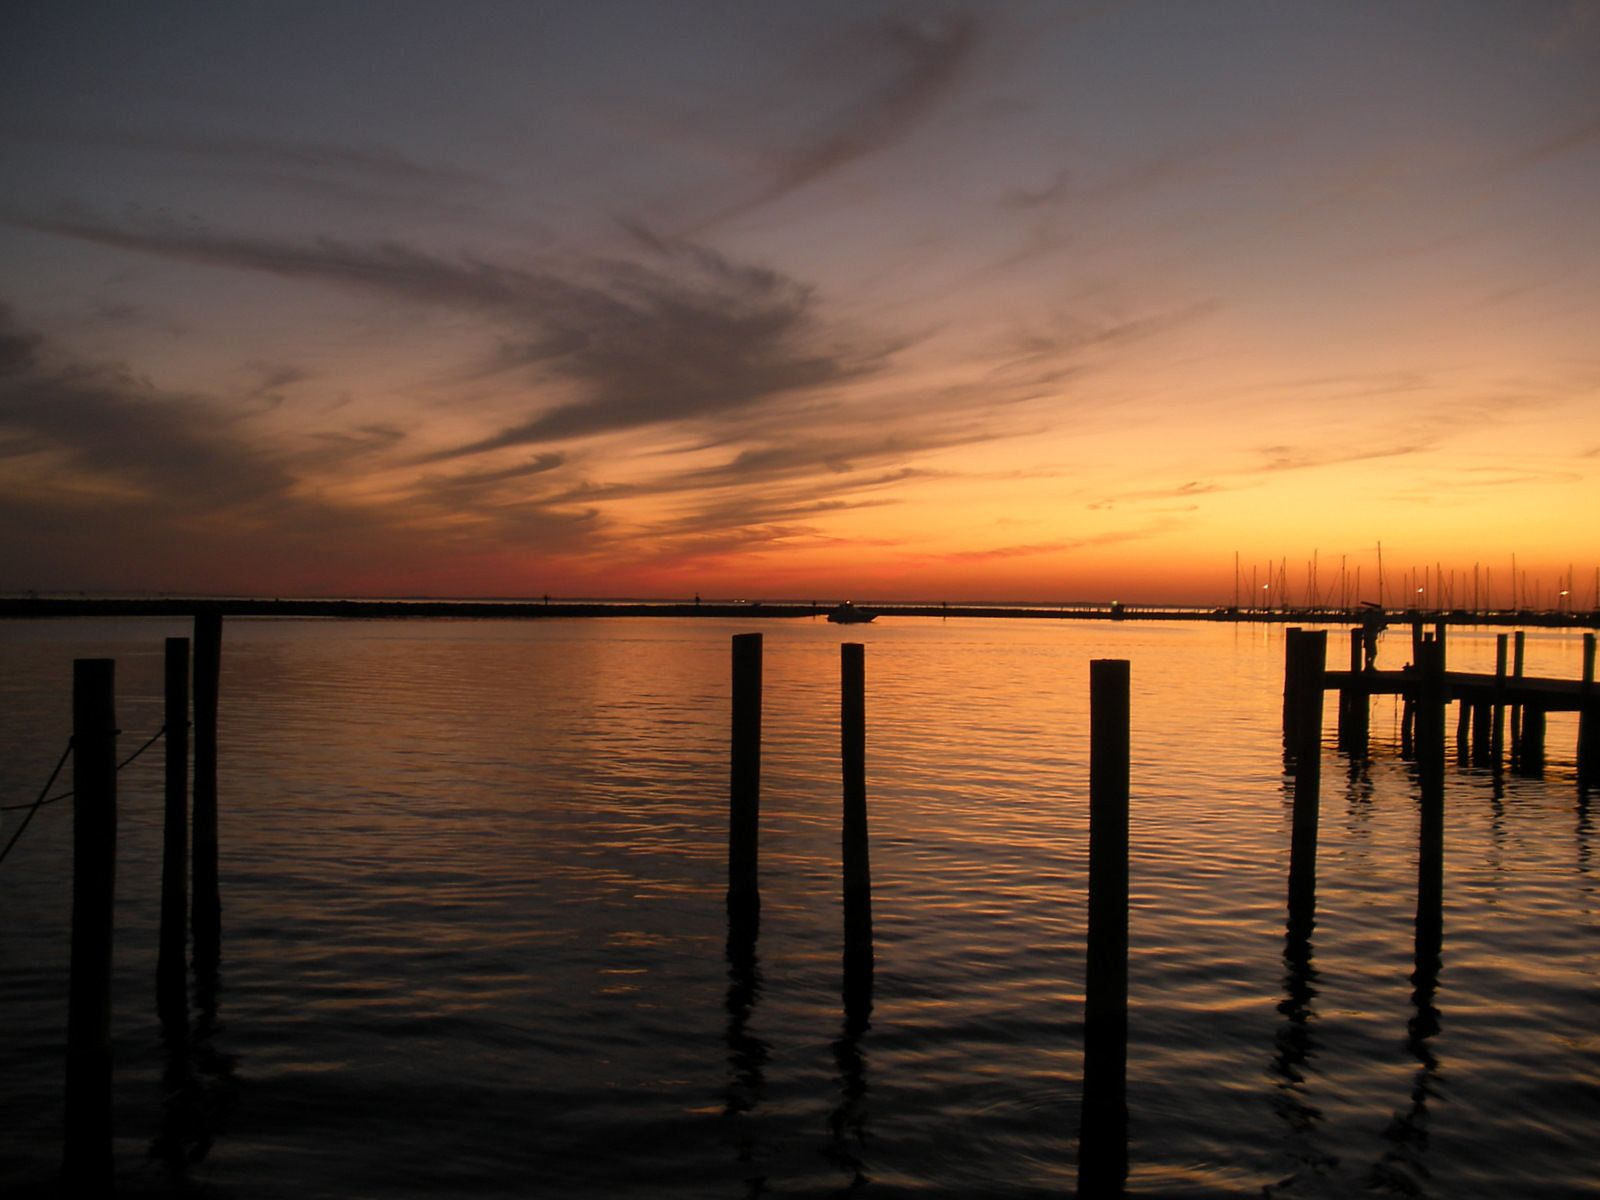 Reminder of a beautiful evening on Chesapeake Bay